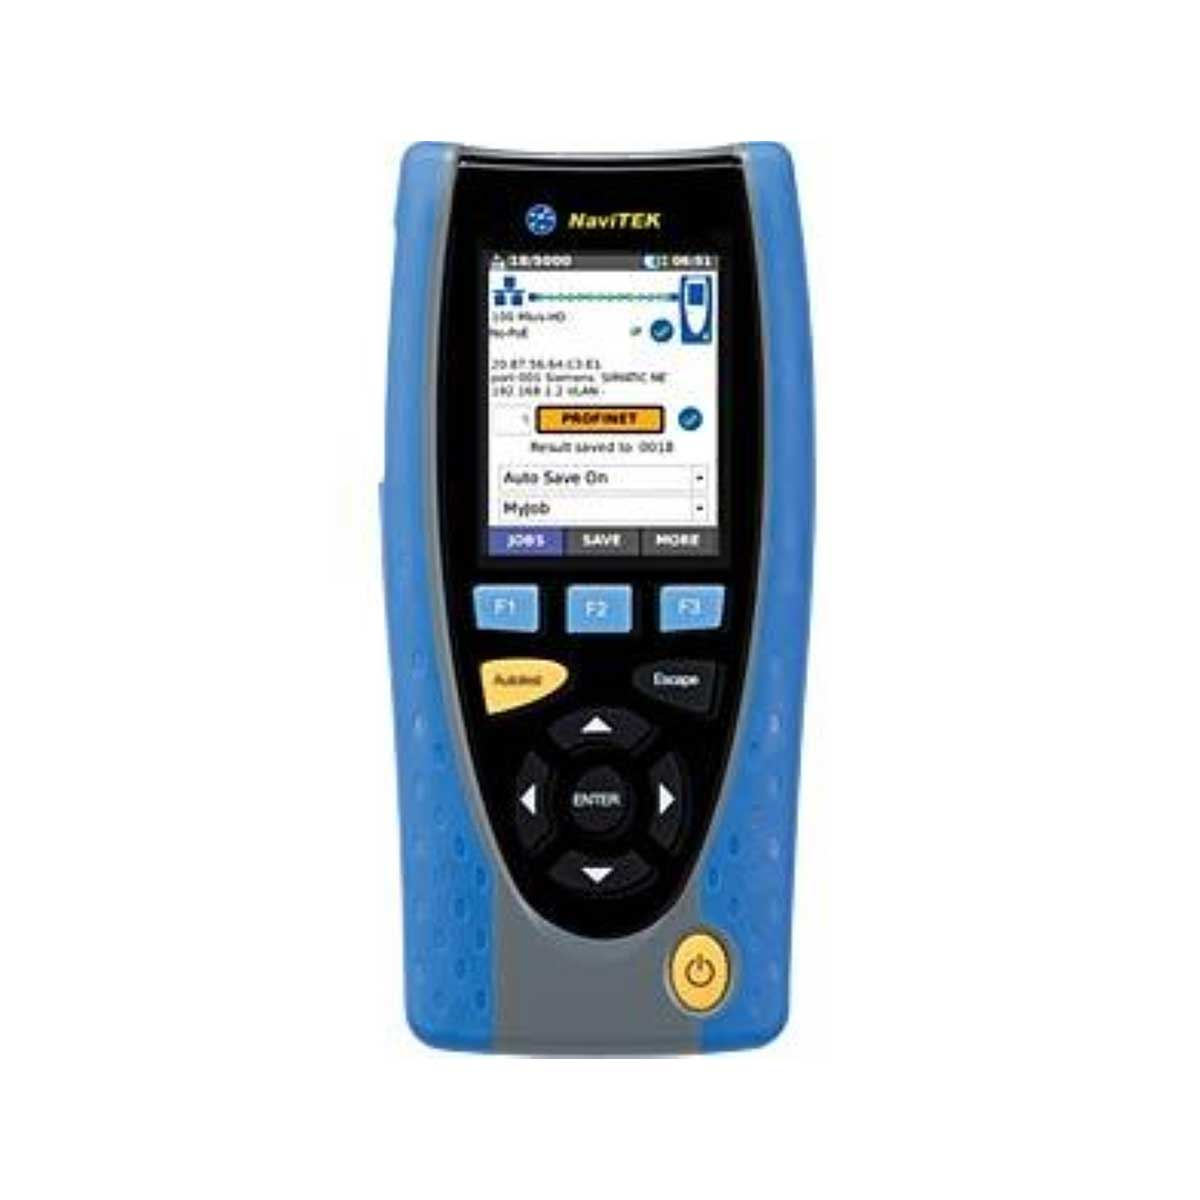 Comprobador de cobre y fibra para redes Ethernet industriales IDEAL NAVITEK IE R151010NAVITEK-IE